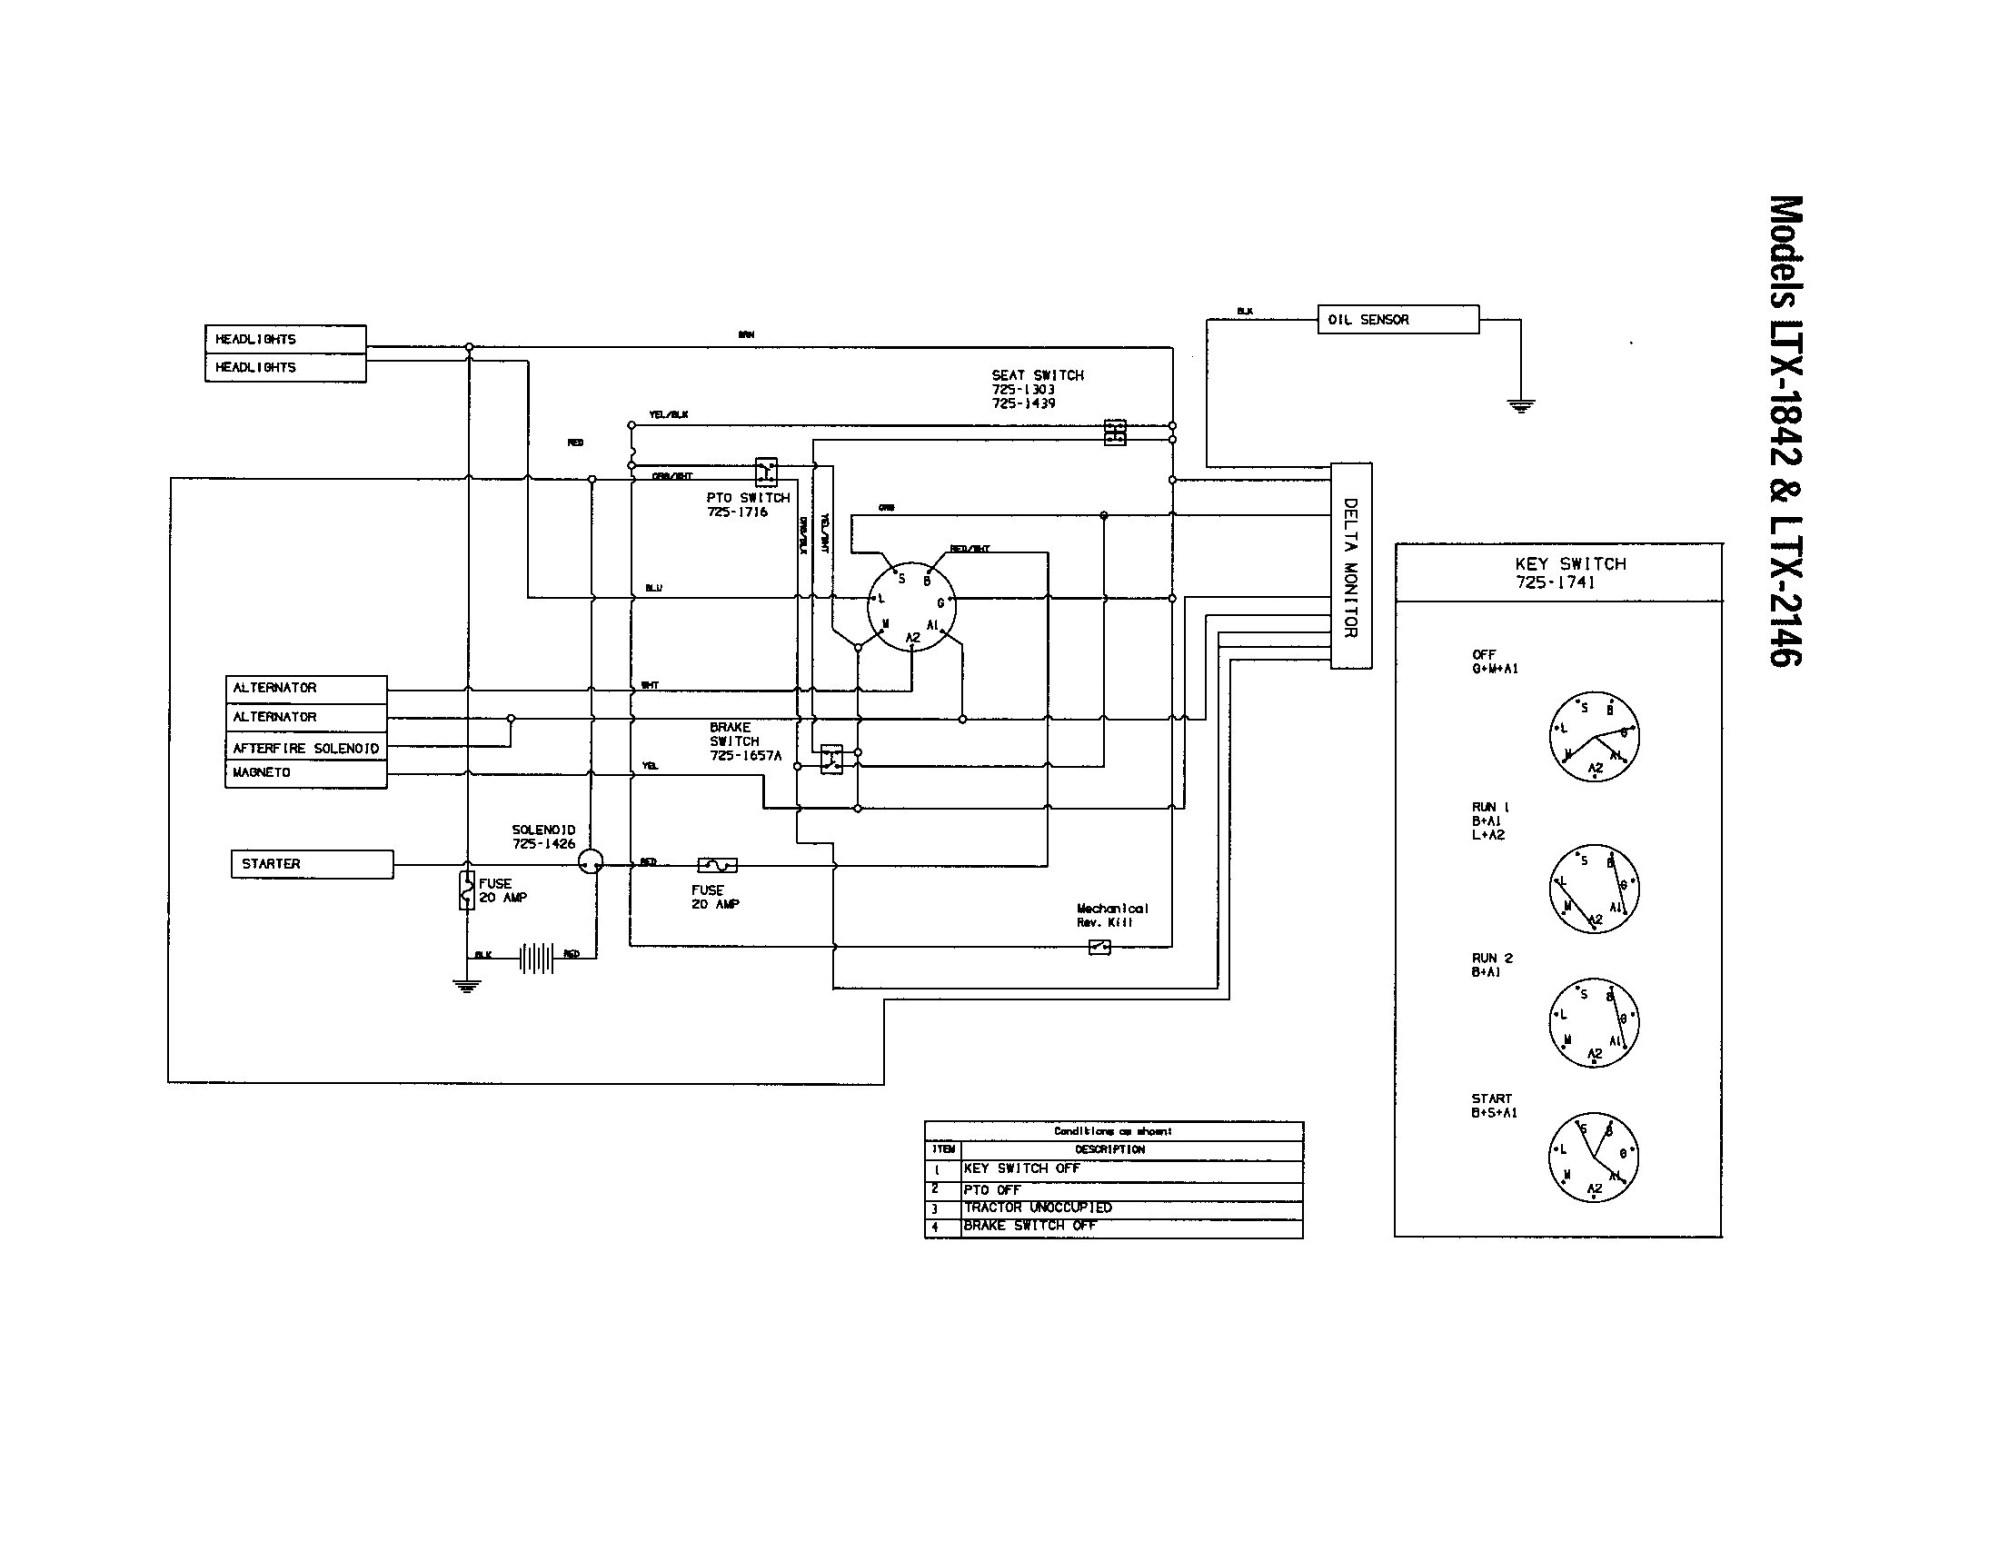 hight resolution of mtd riding lawn mower wiring diagram wiring diagram yard machine lawn tractor 2018 yard machine